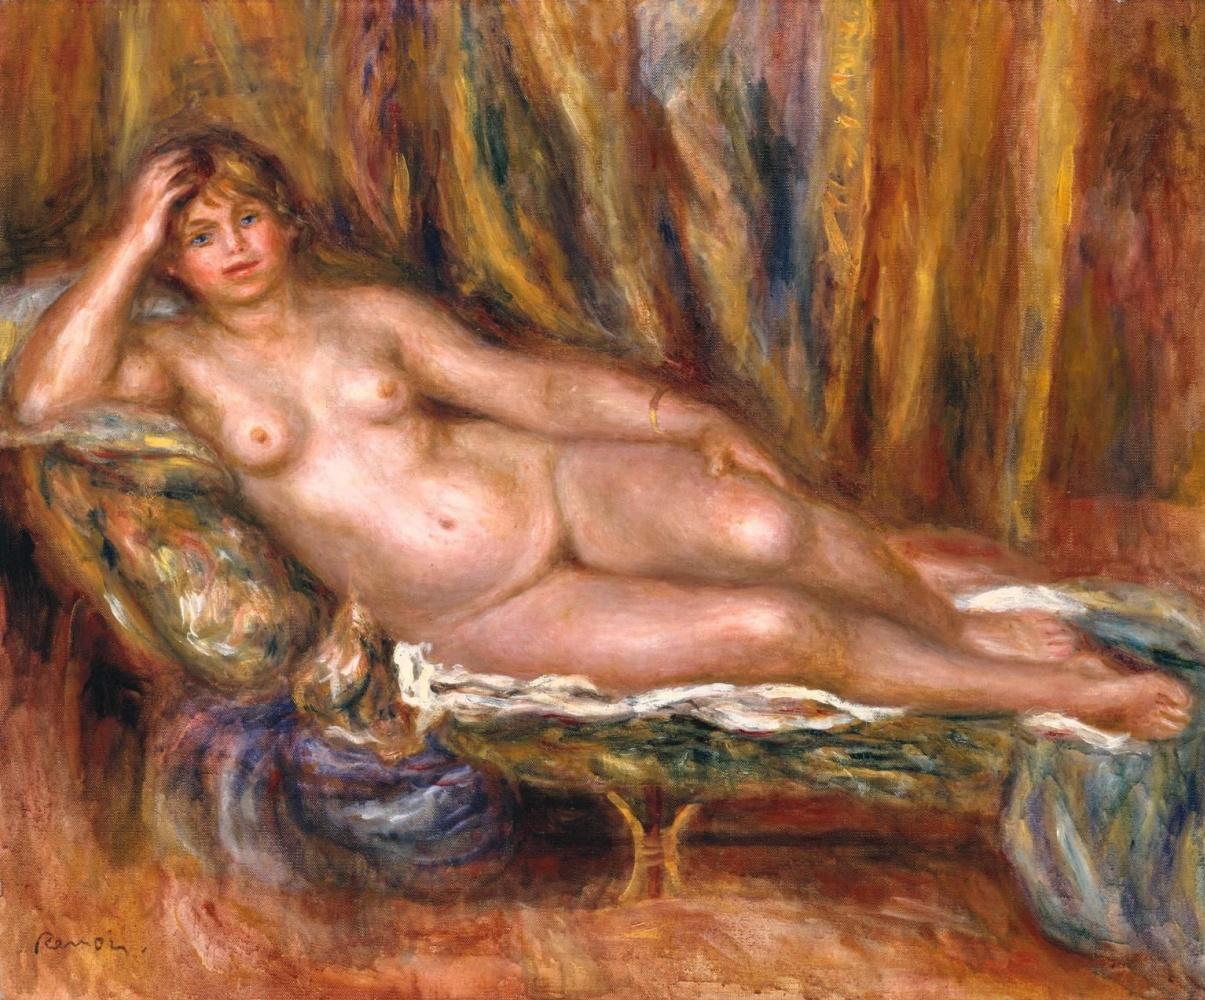 naked-renoir-paintings-hot-cougar-riding-dick-gif